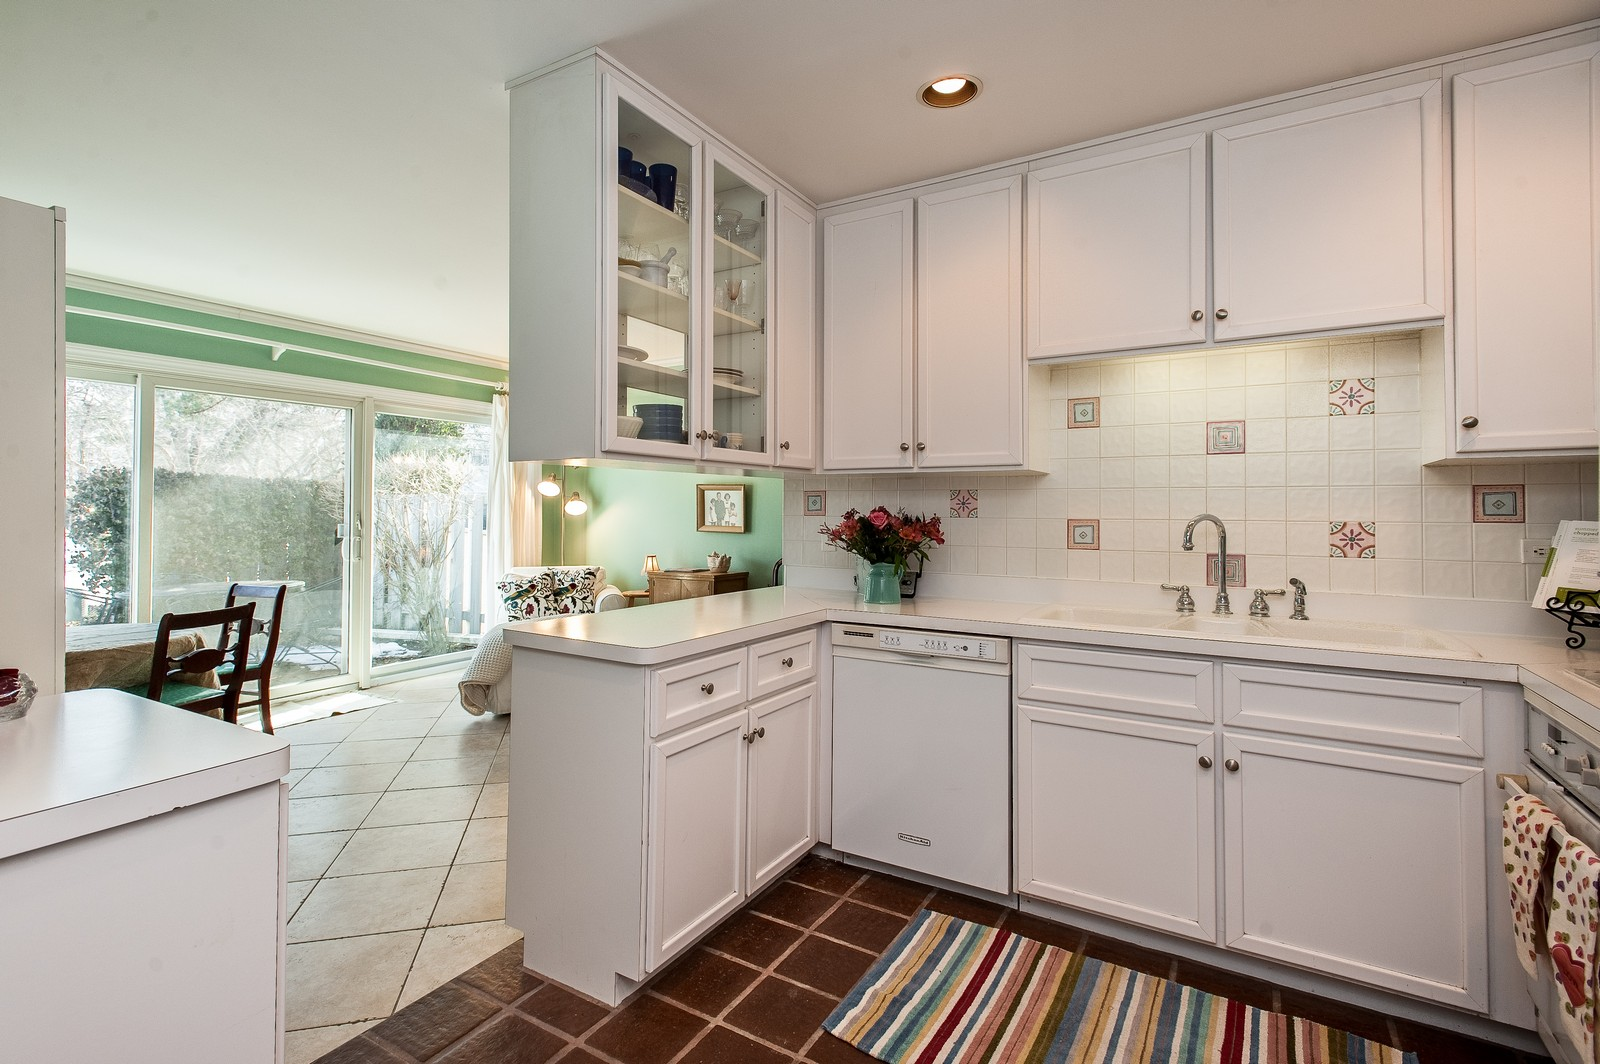 Real Estate Photography - 389 Bristol, Northfield, IL, 60093 - Kitchen